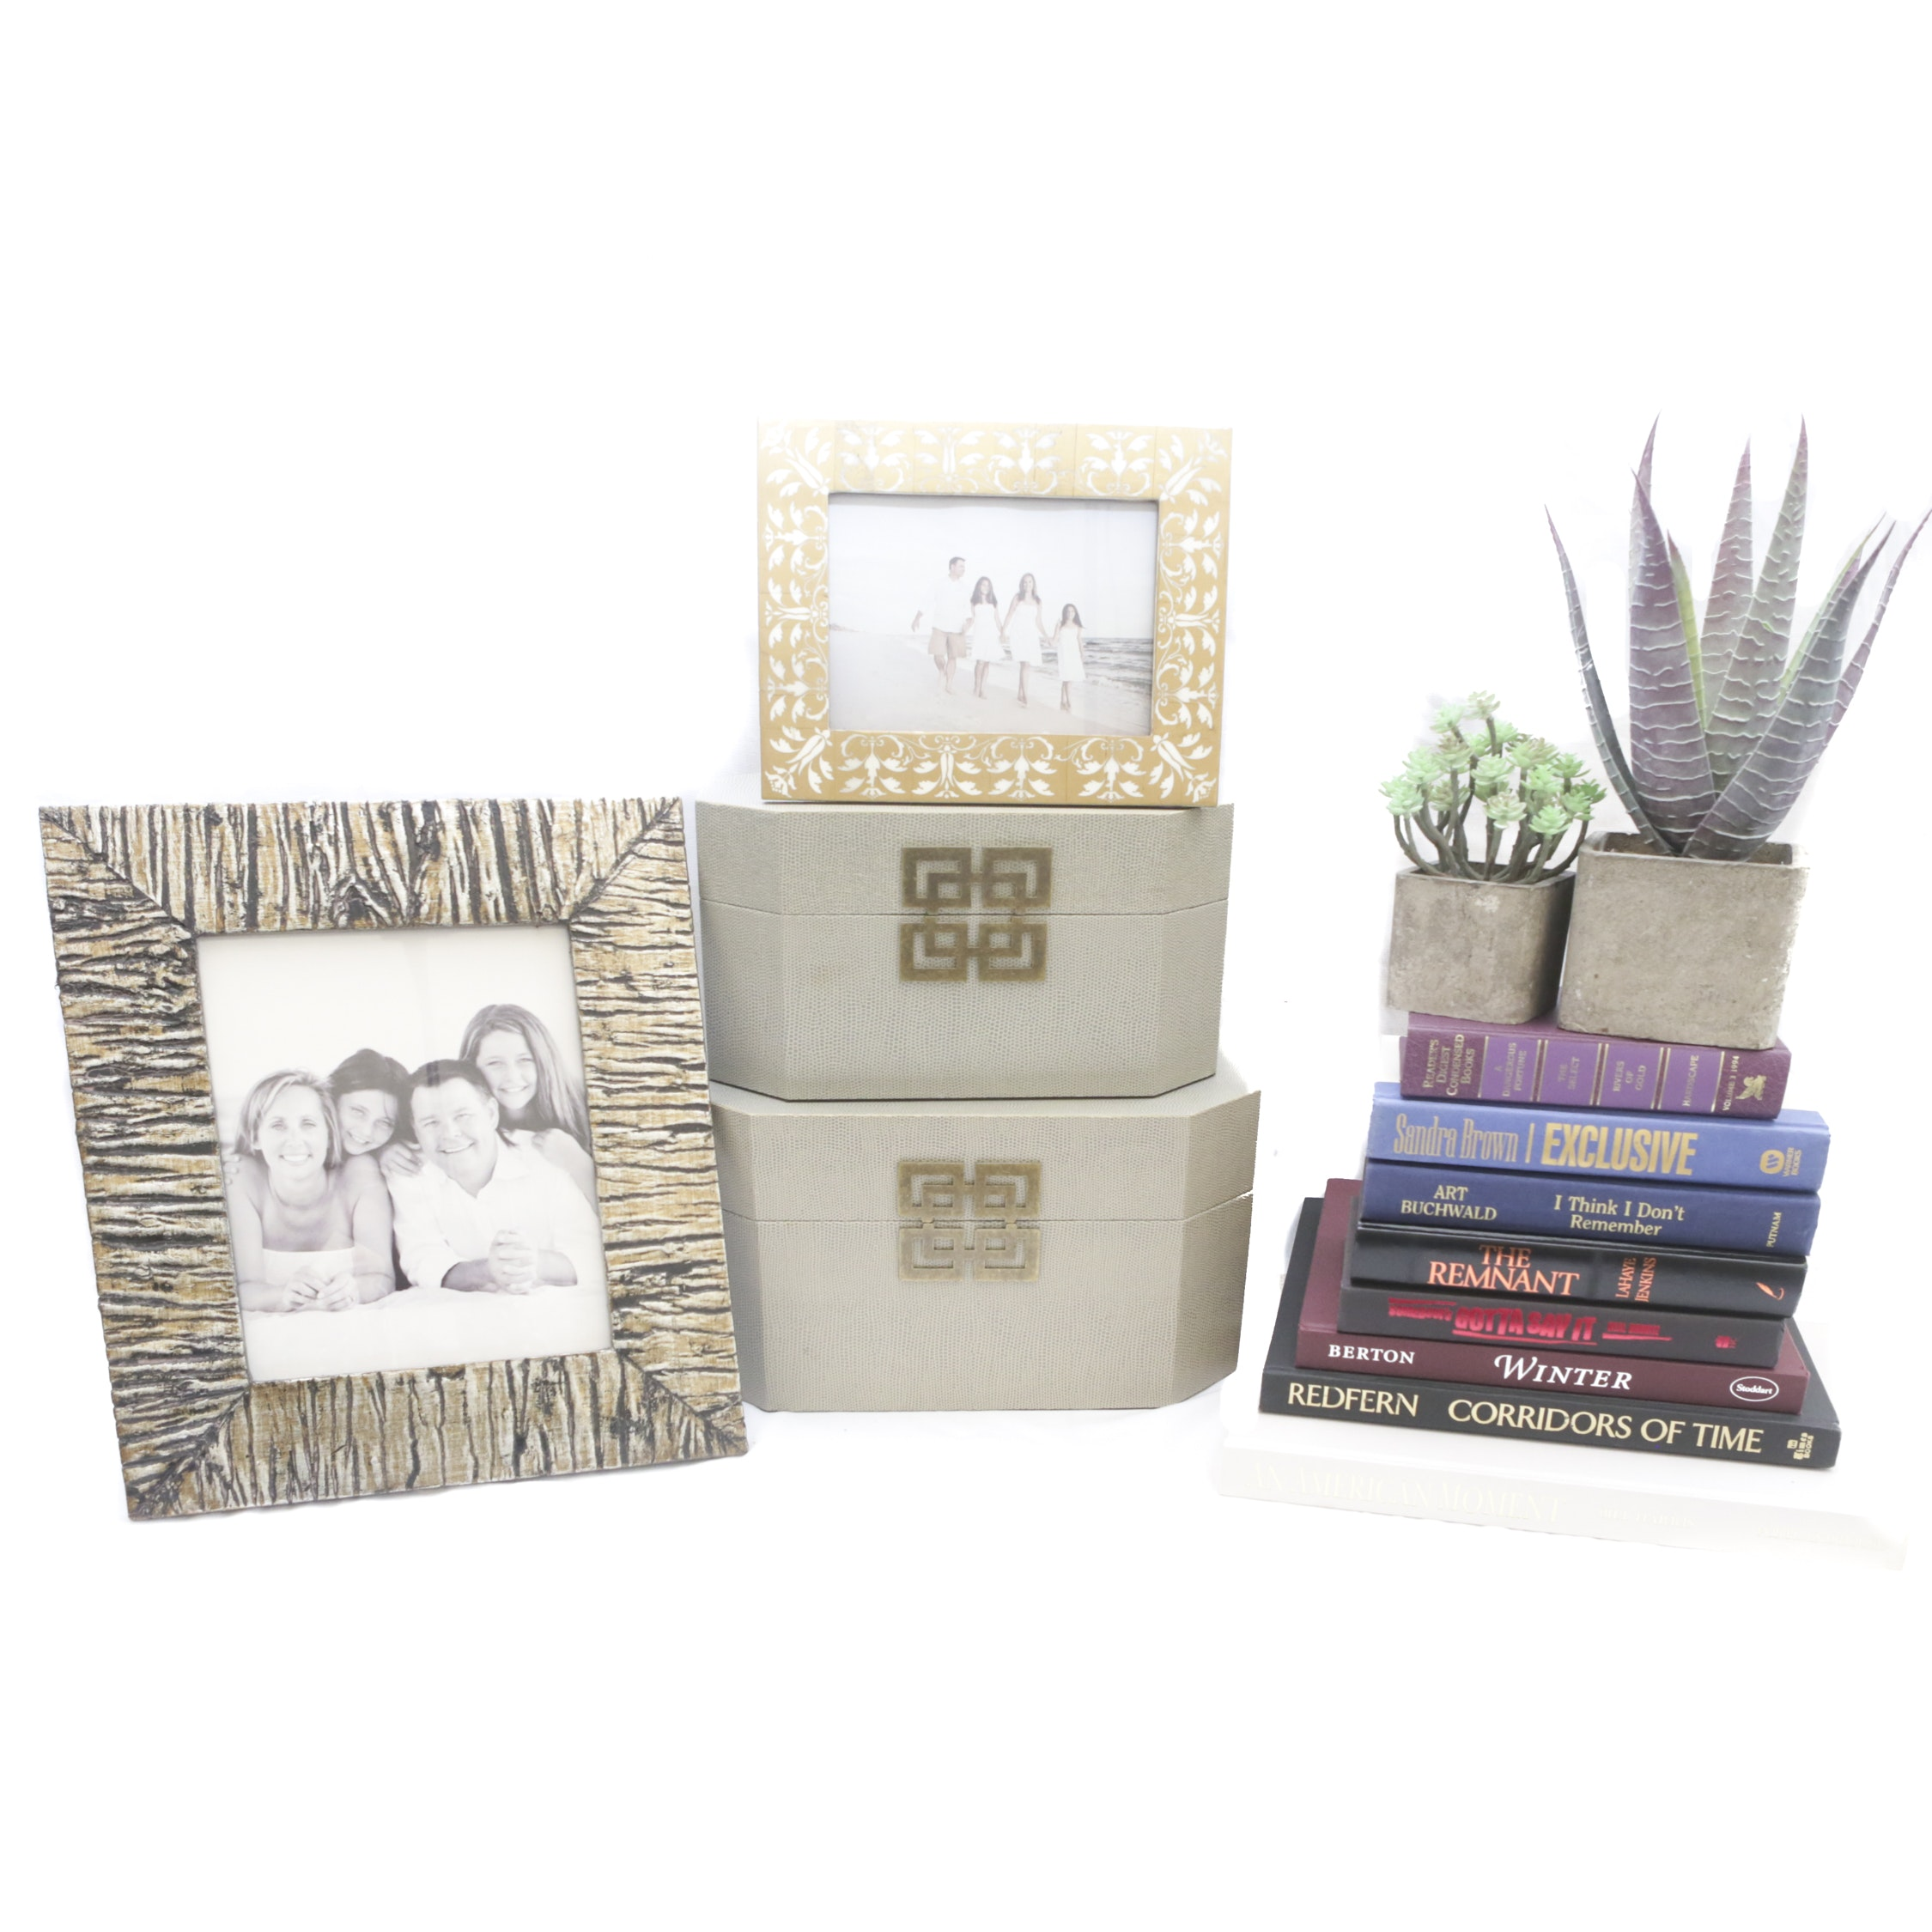 Picture Frames, Decorative Boxes, Faux Succulents and Books